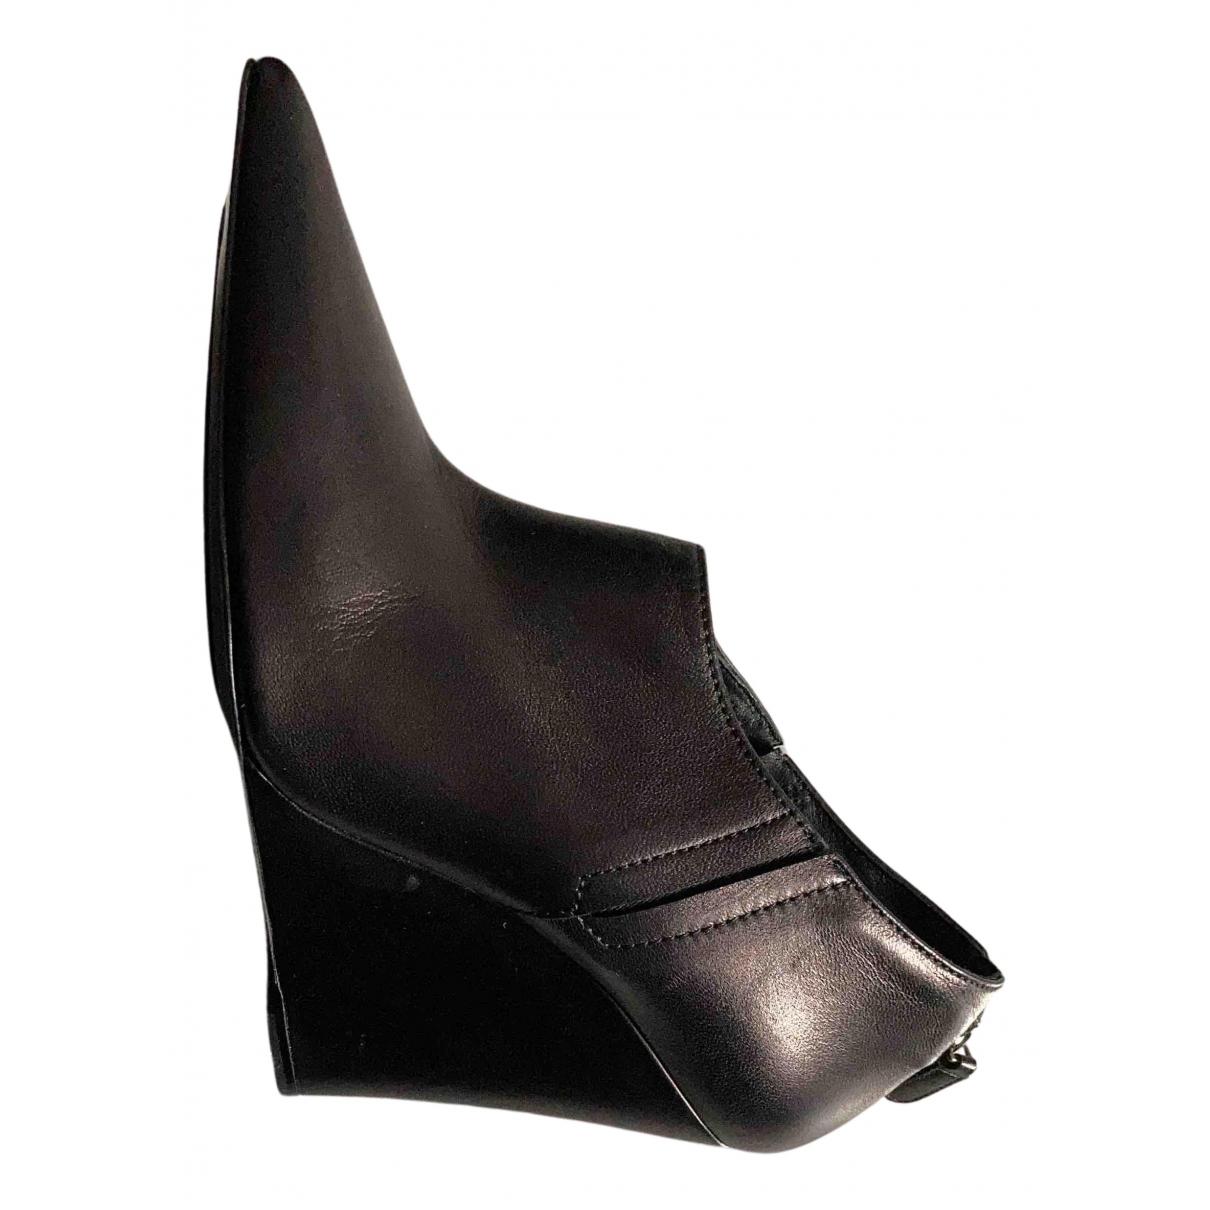 Barbara Bui N Black Leather Lace ups for Women 40 EU